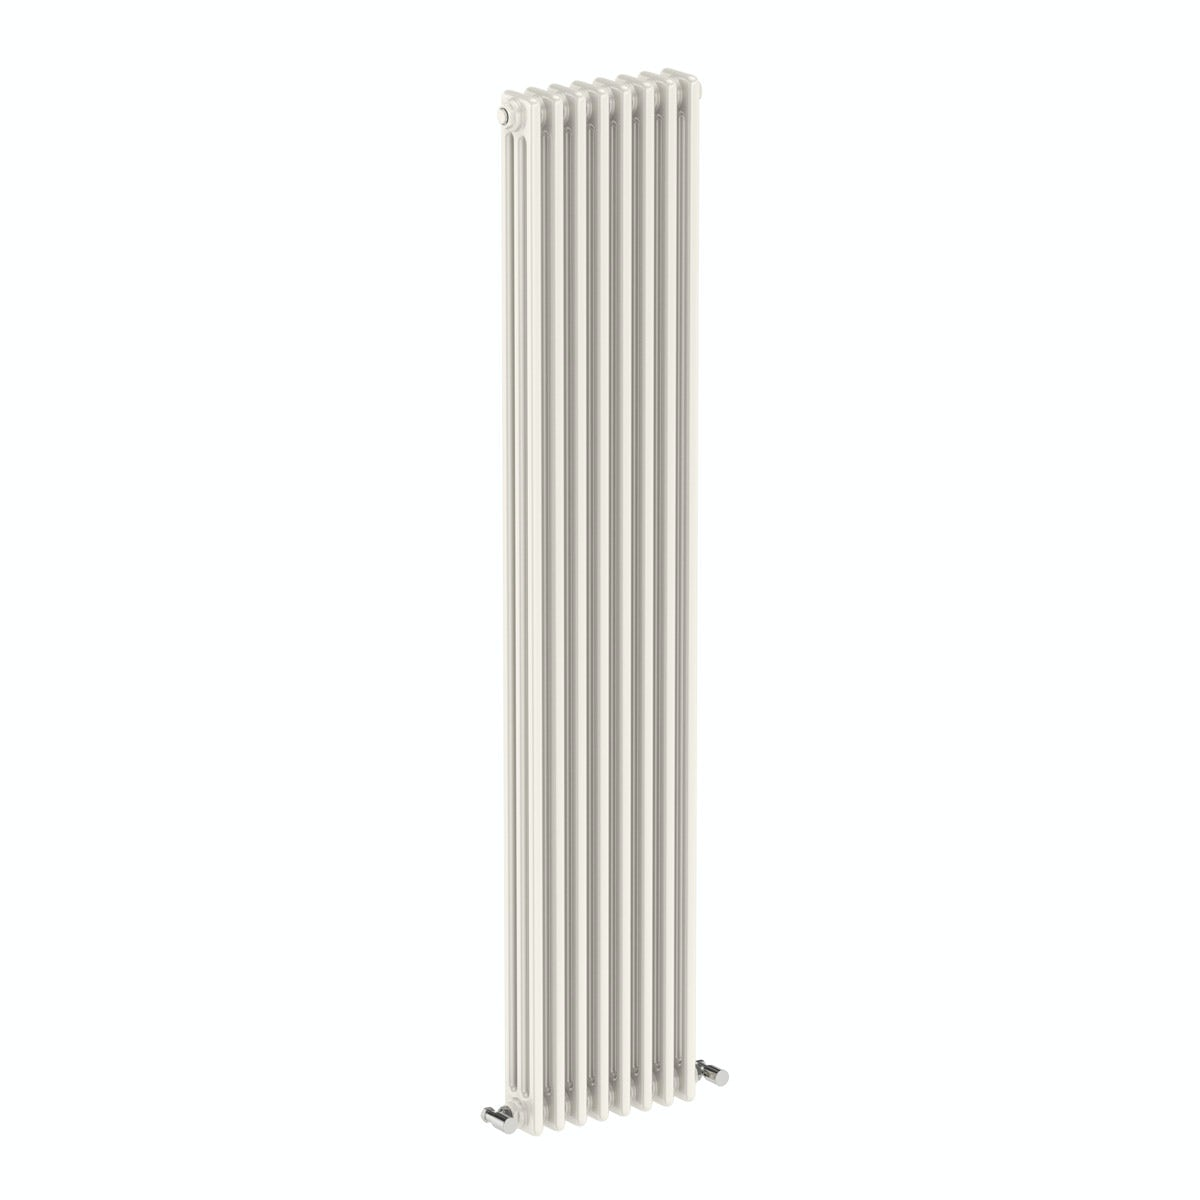 The Bath Co. Dulwich vertical white triple column radiator 1800 x 380 offer pack